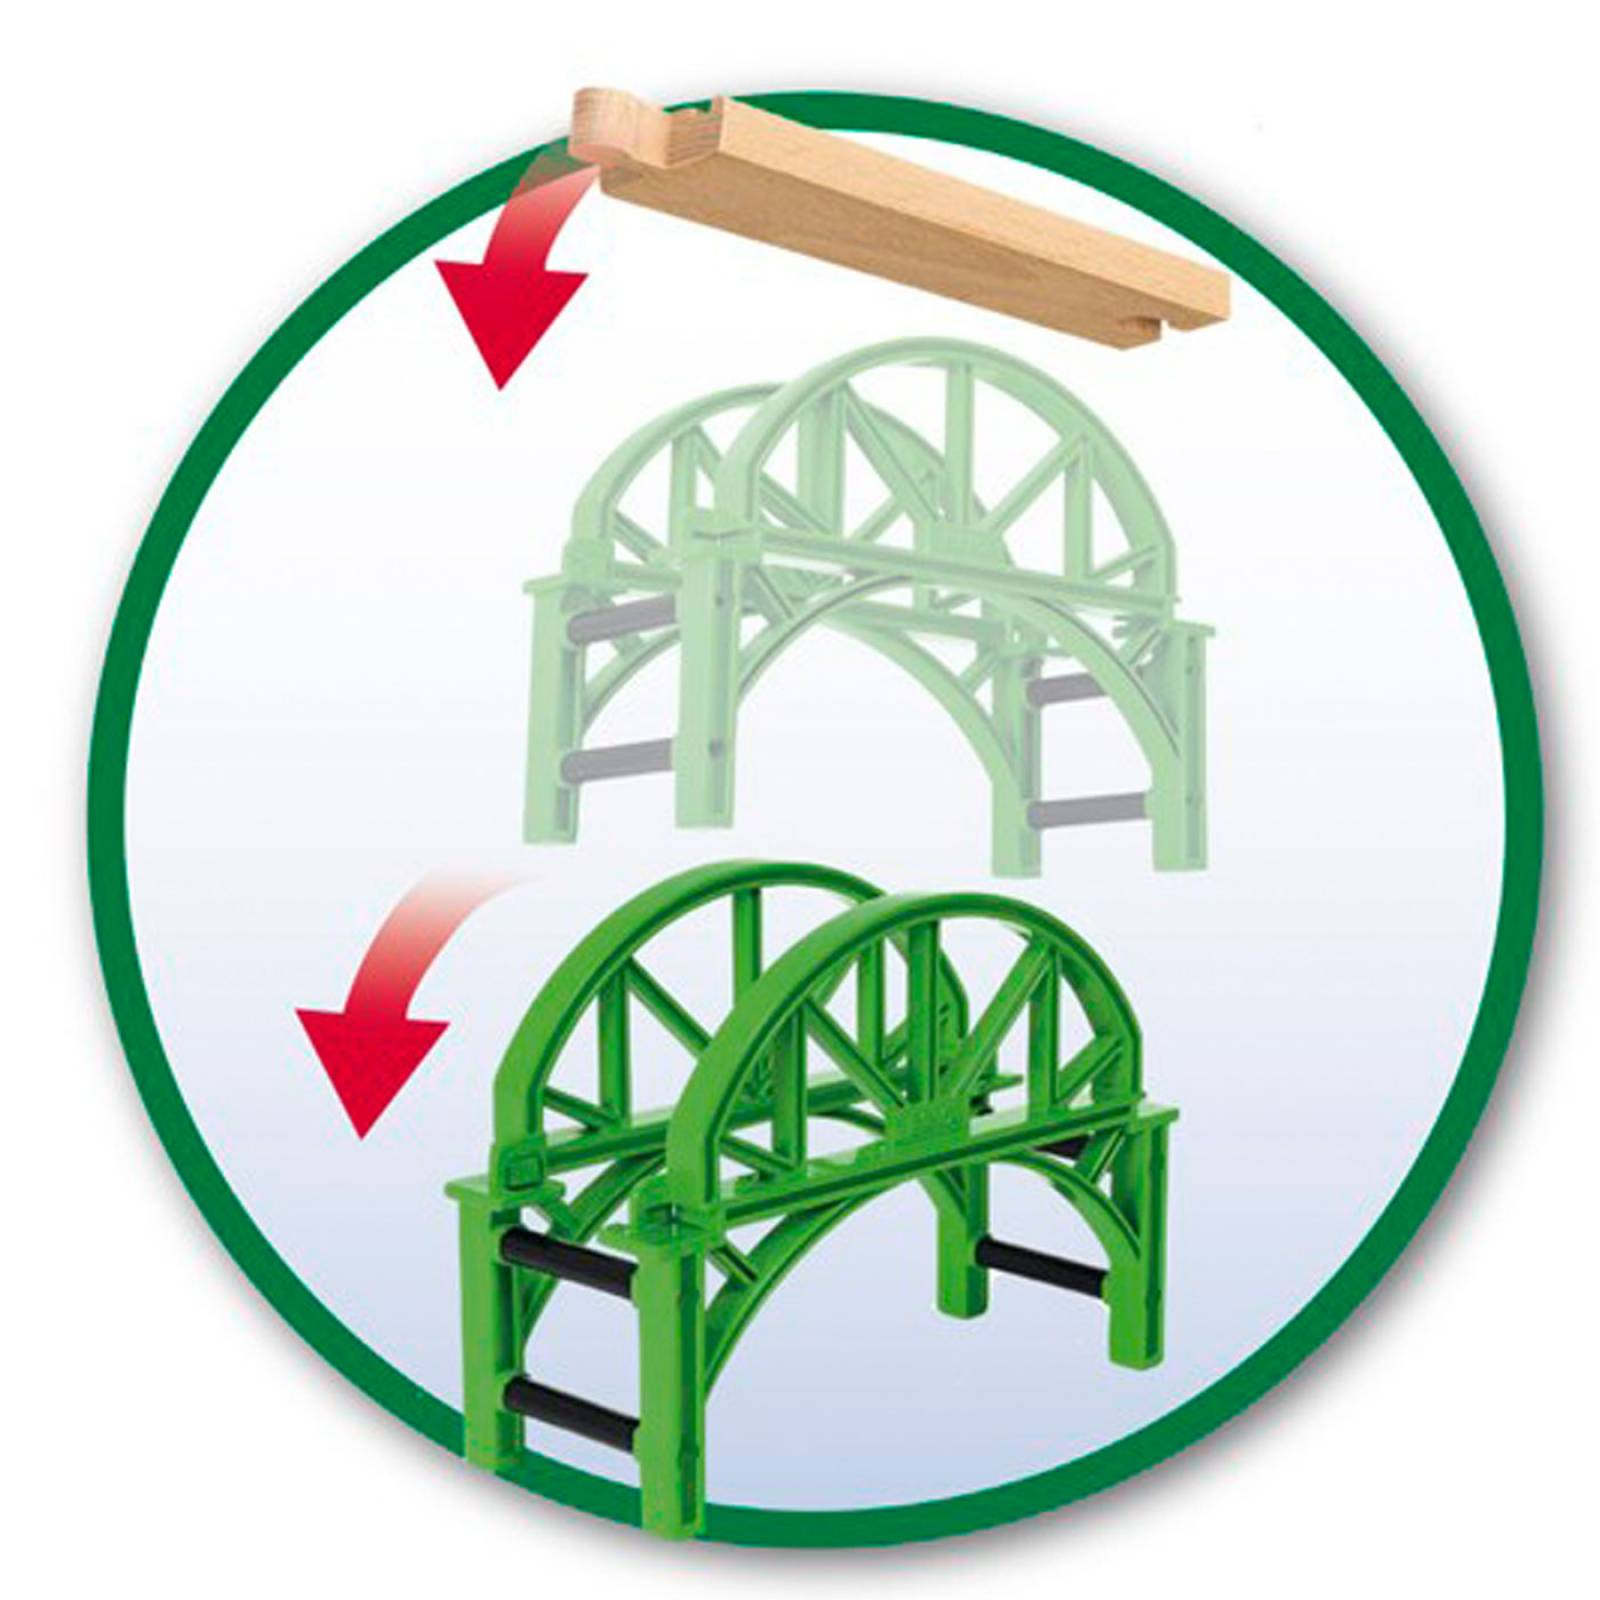 Stackable Bridge BRIO Wooden Railway Age 3+ thumbnails